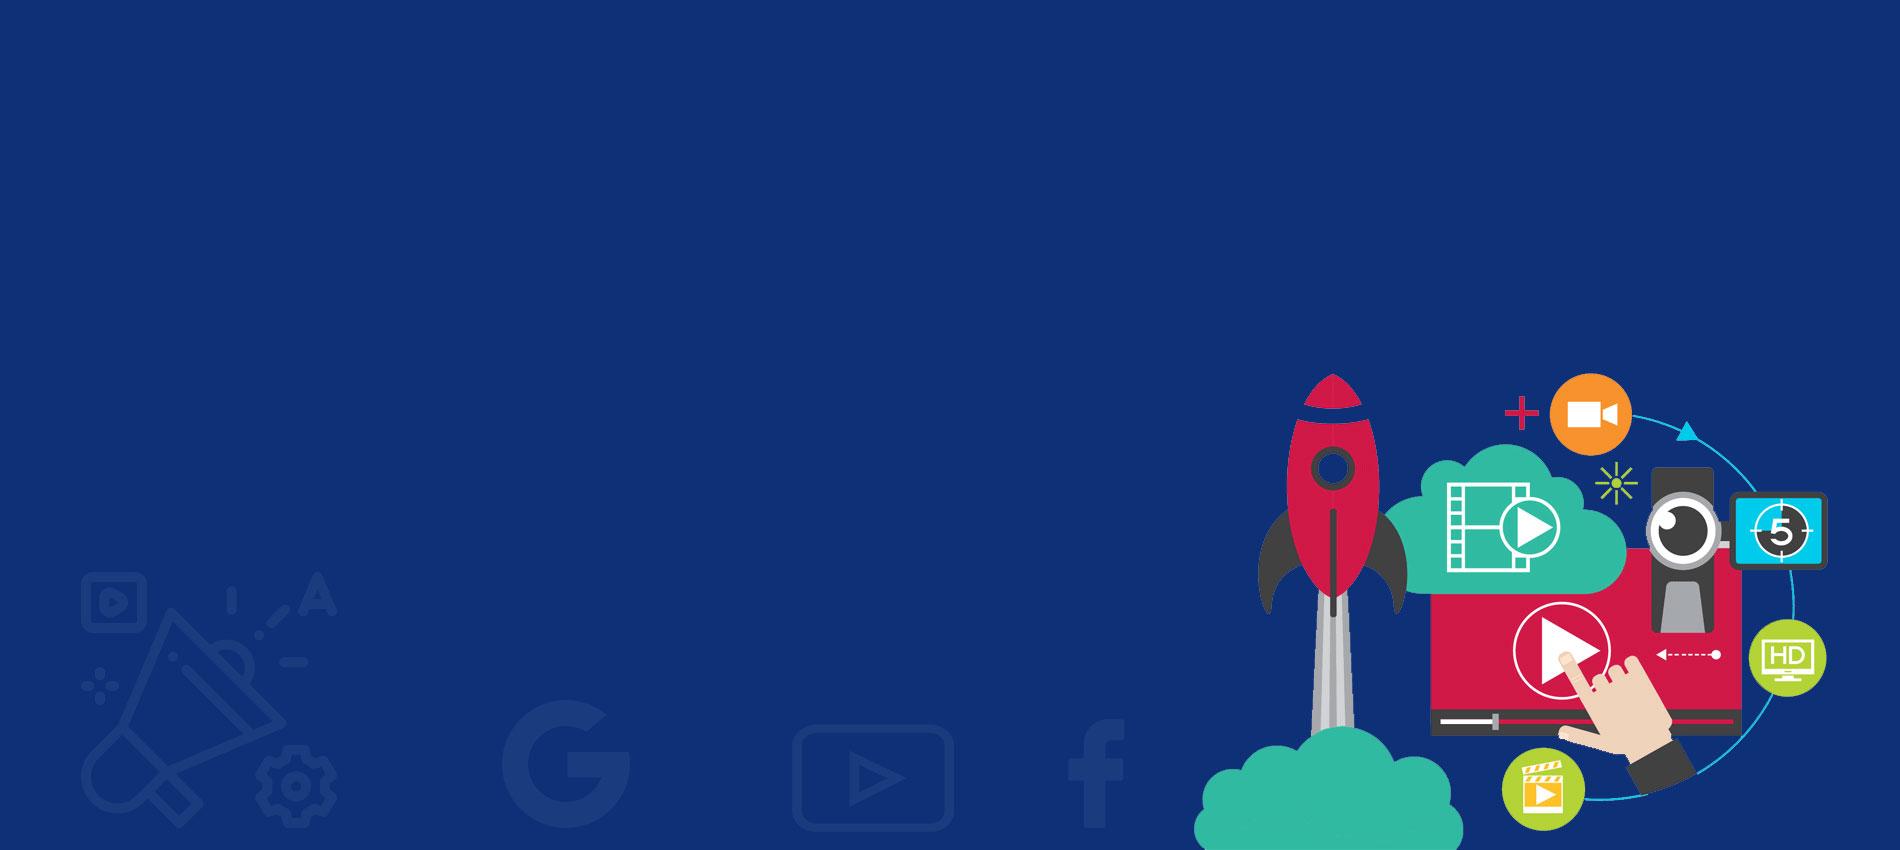 Dịch vụ google adwords